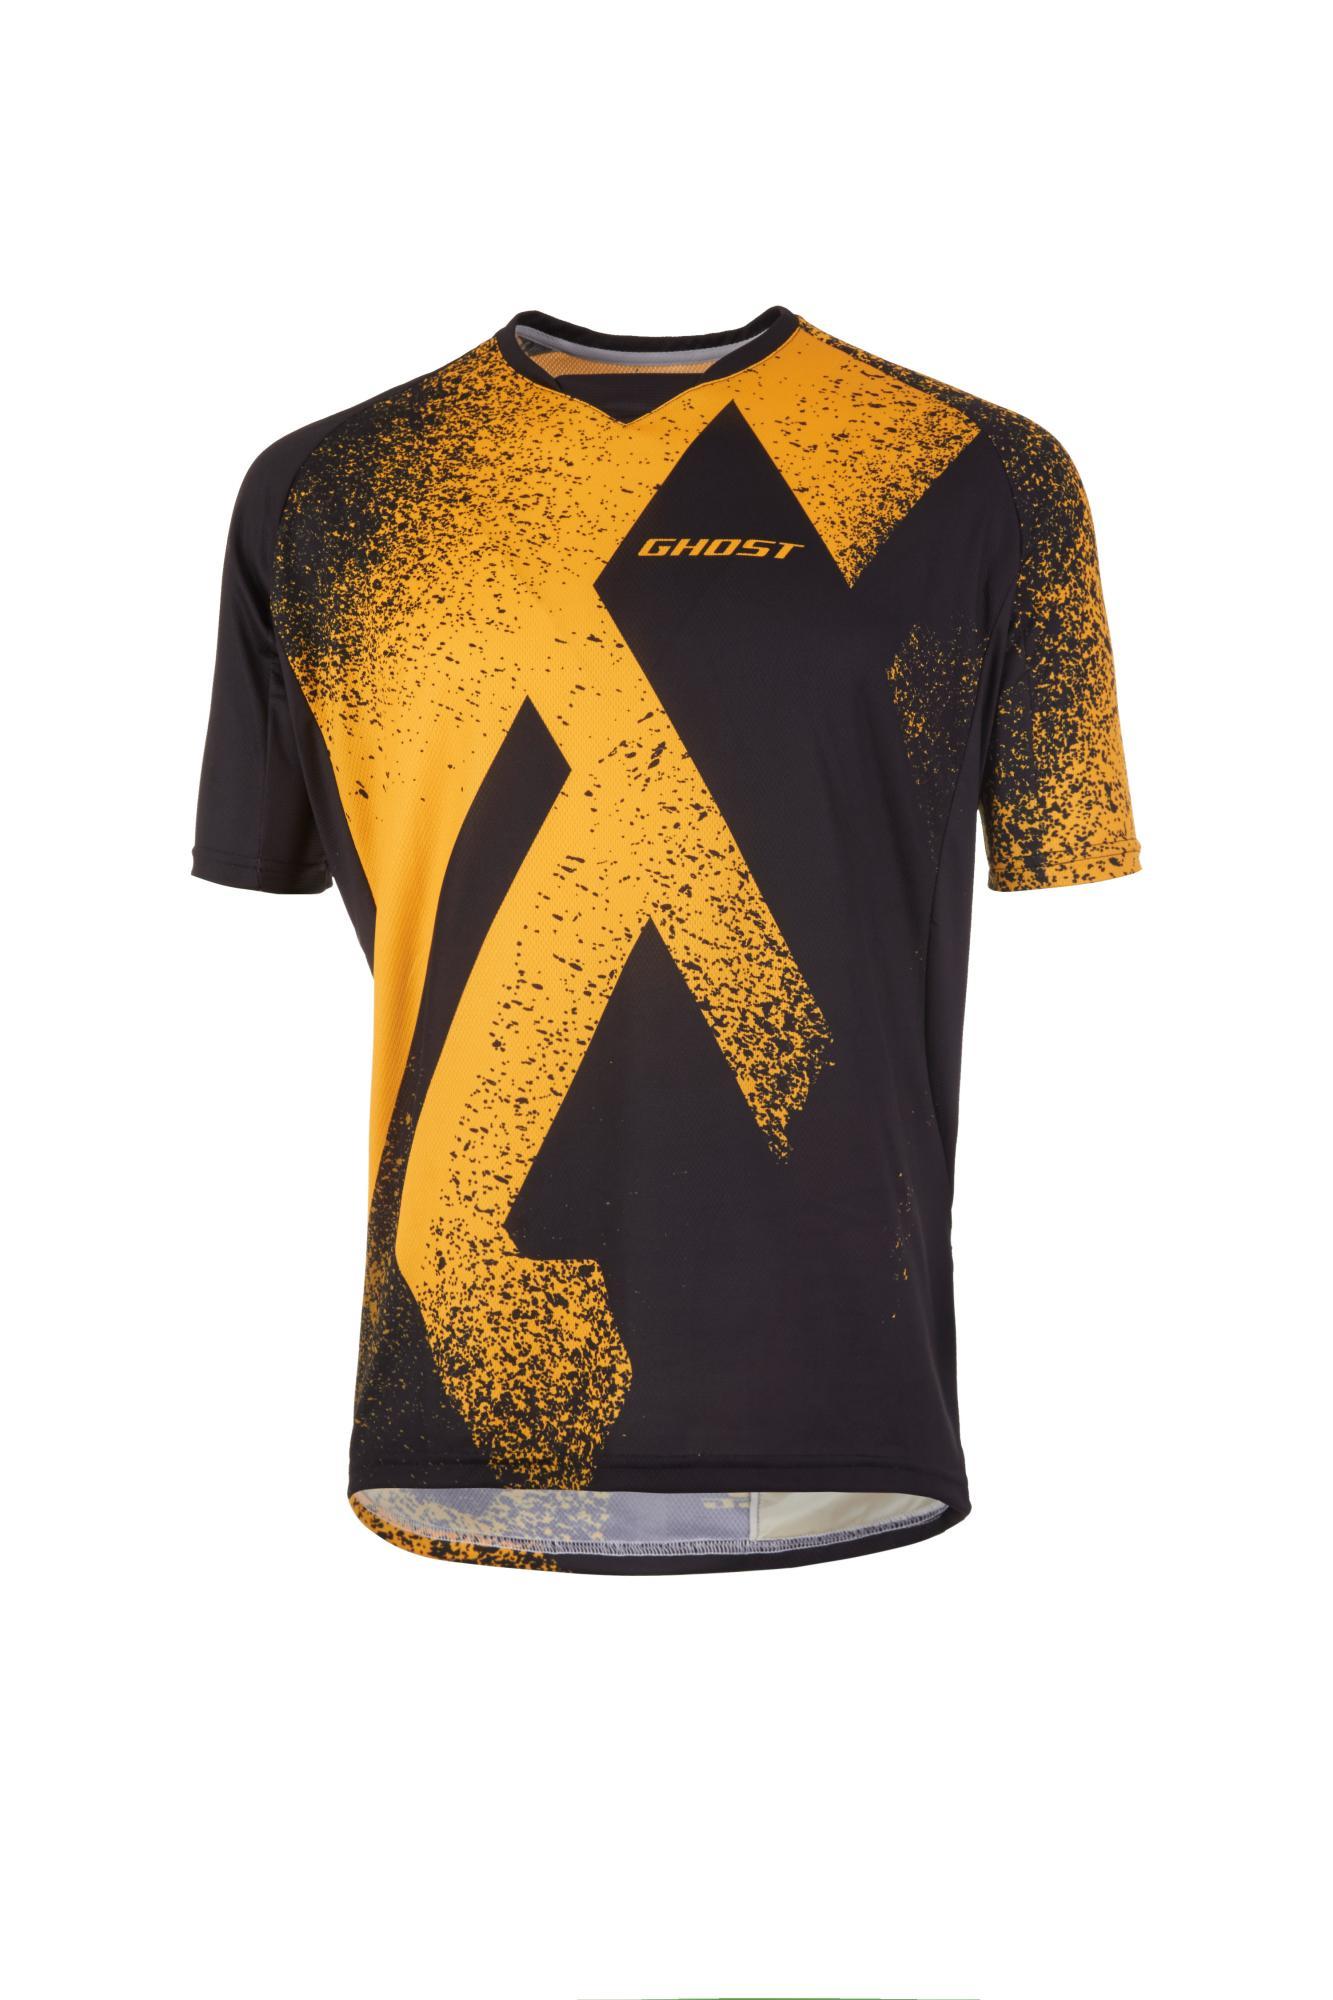 ec842b462608 GHOST oblečenie Dres   Jersey MTN Ride Line yellow   black 2019 - E ...